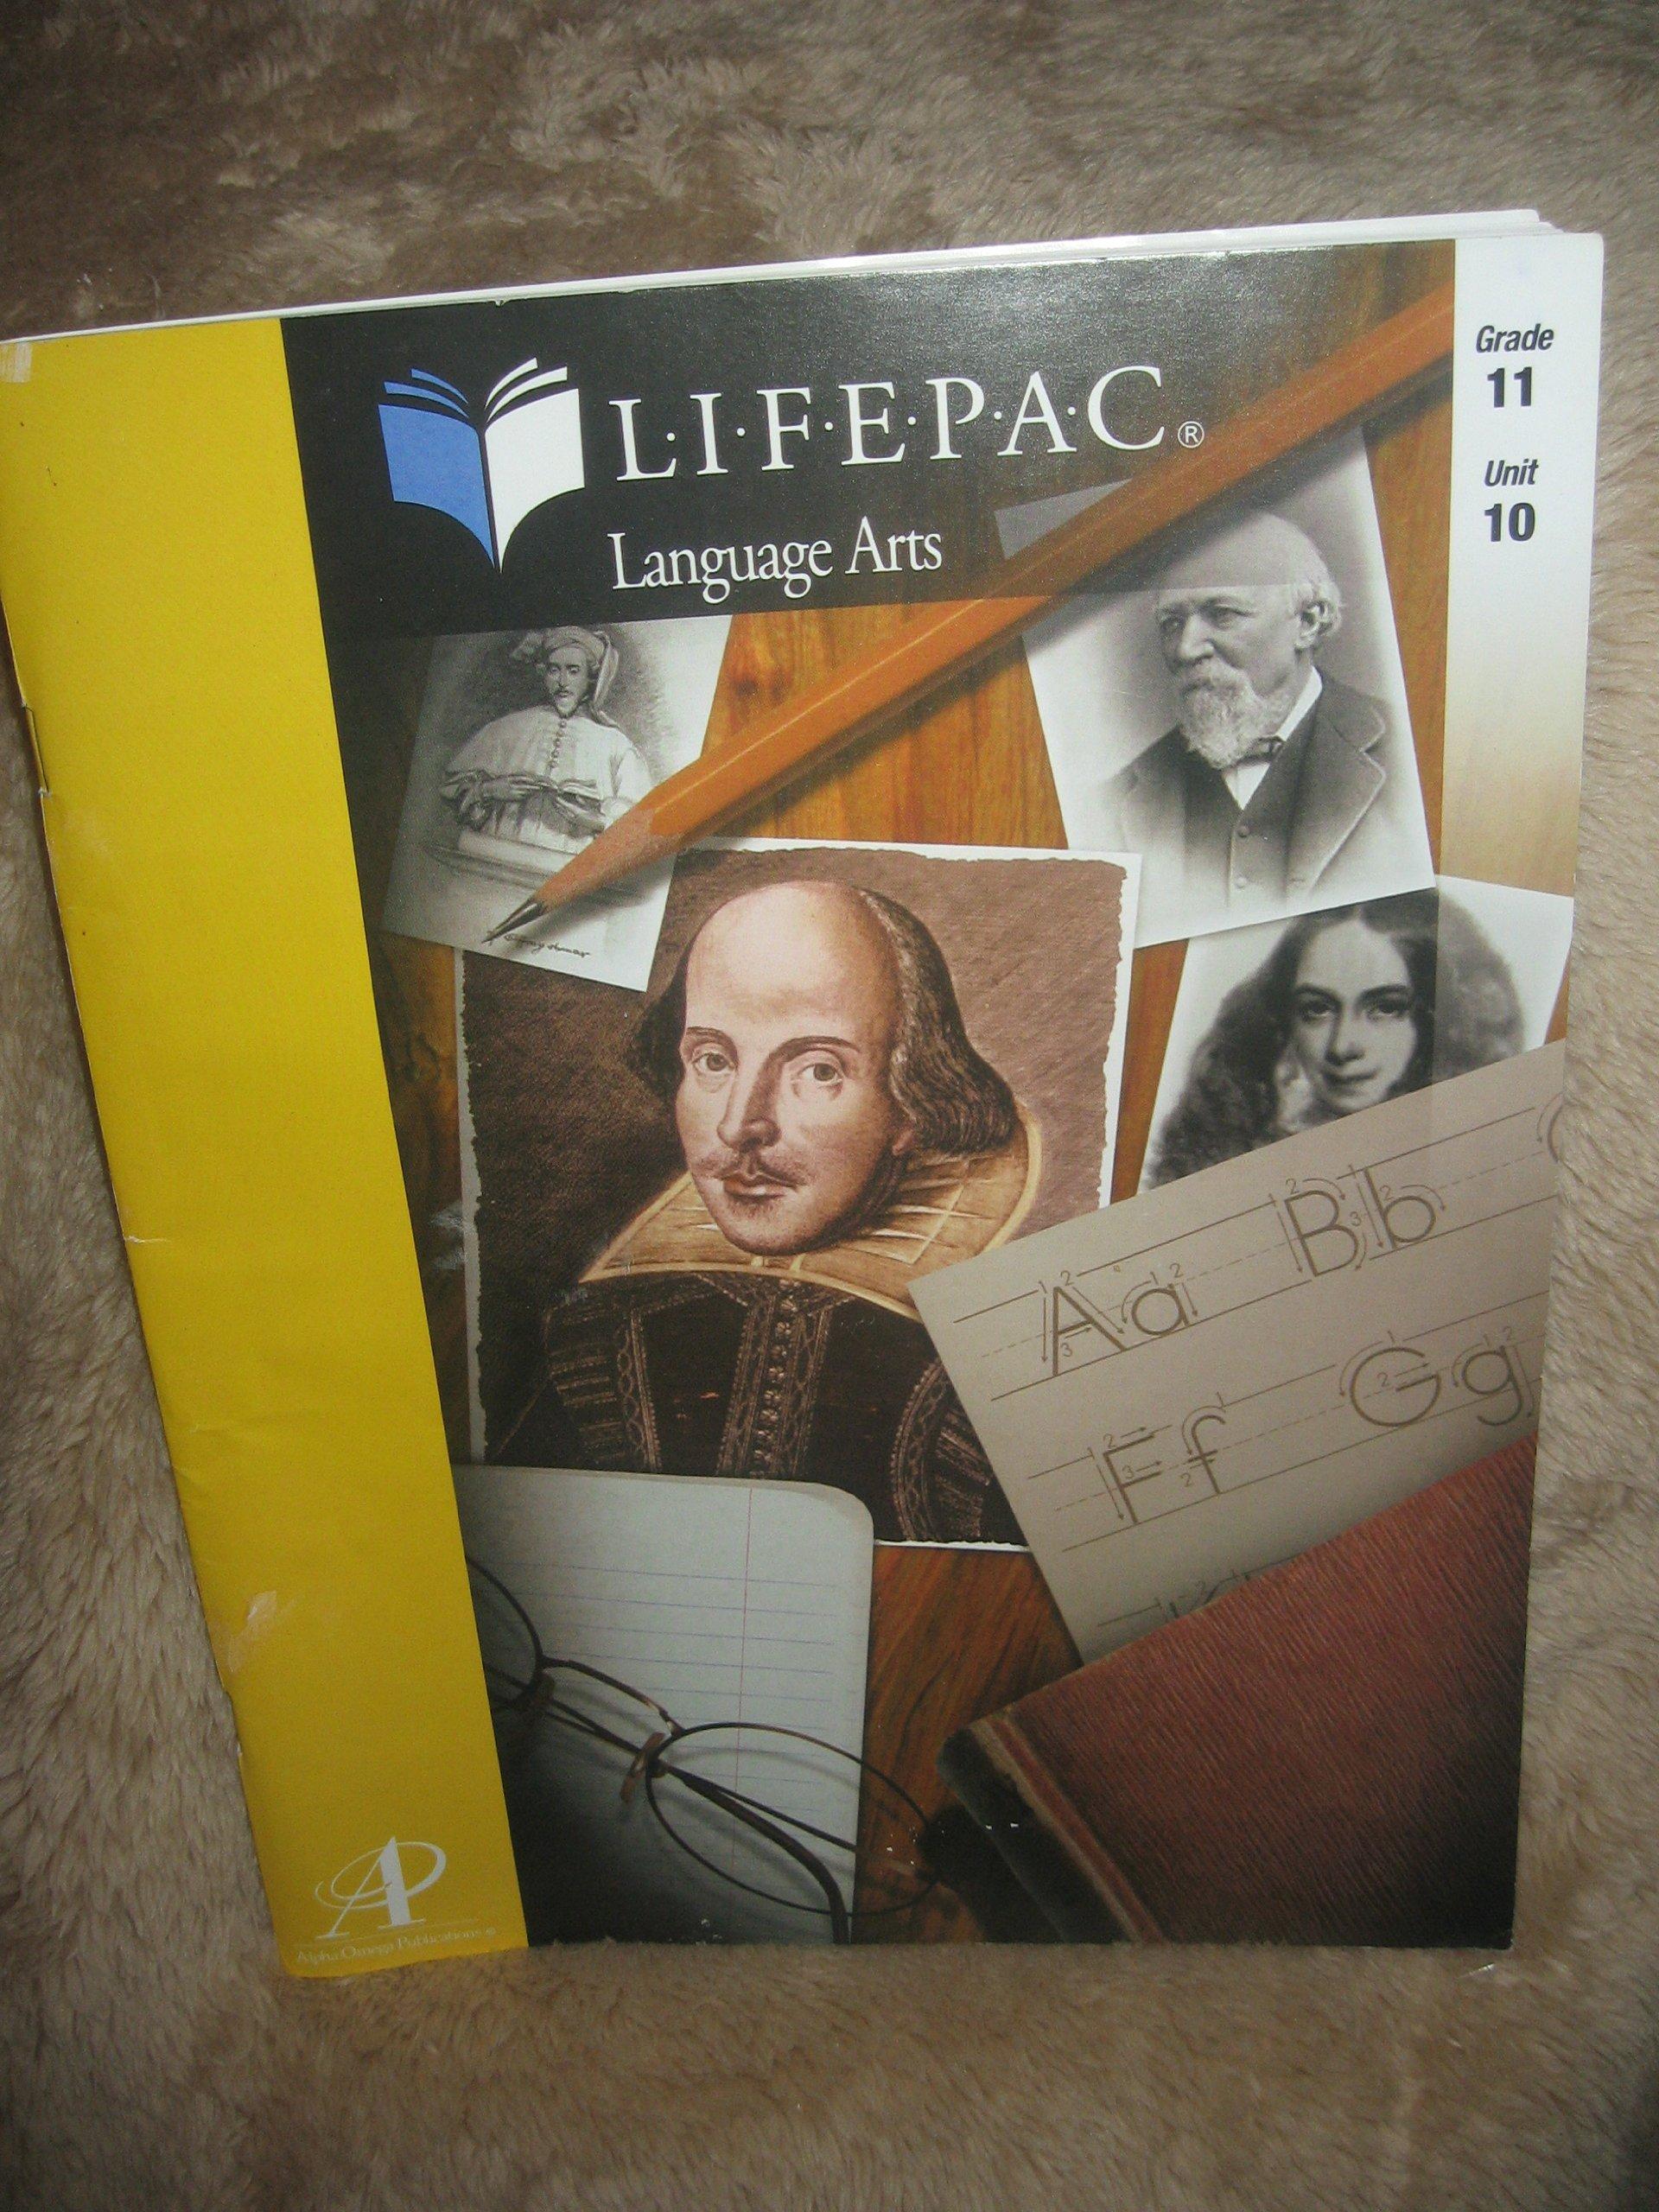 Lifepac Language Arts Grade 11 Unit 10 Reviewing Communication Skills and Literature pdf